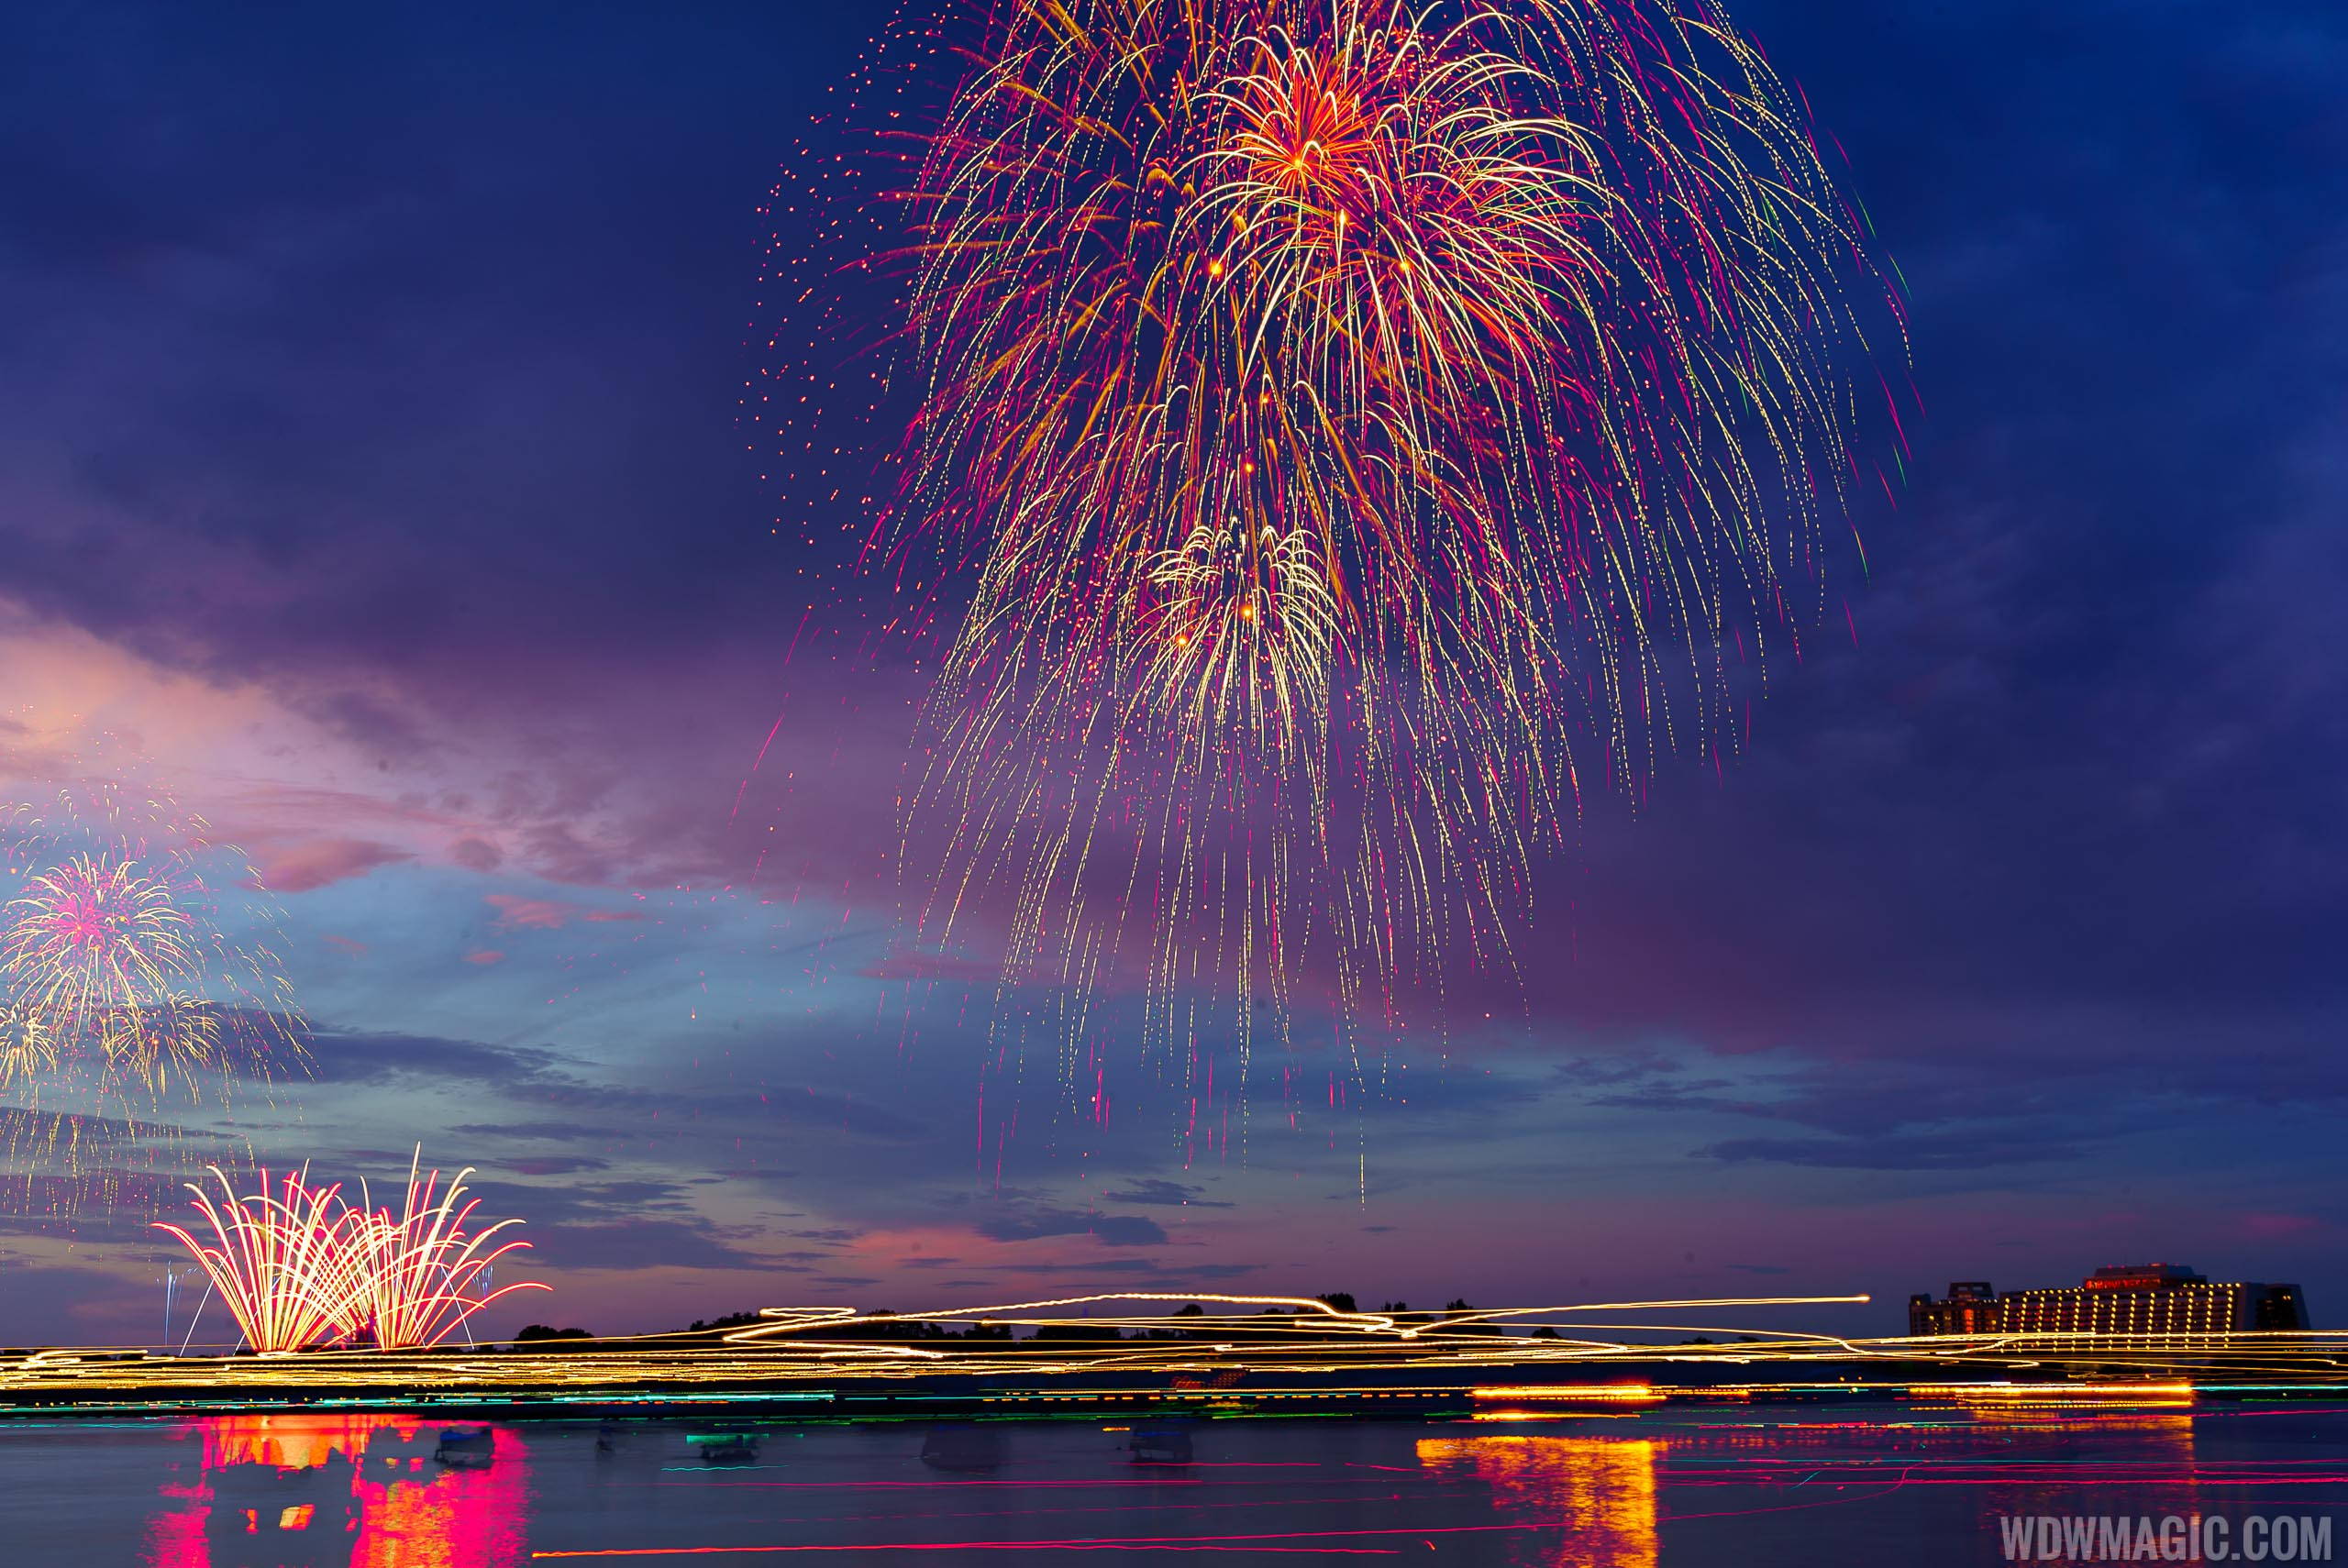 Disney's Celebrate America firework show